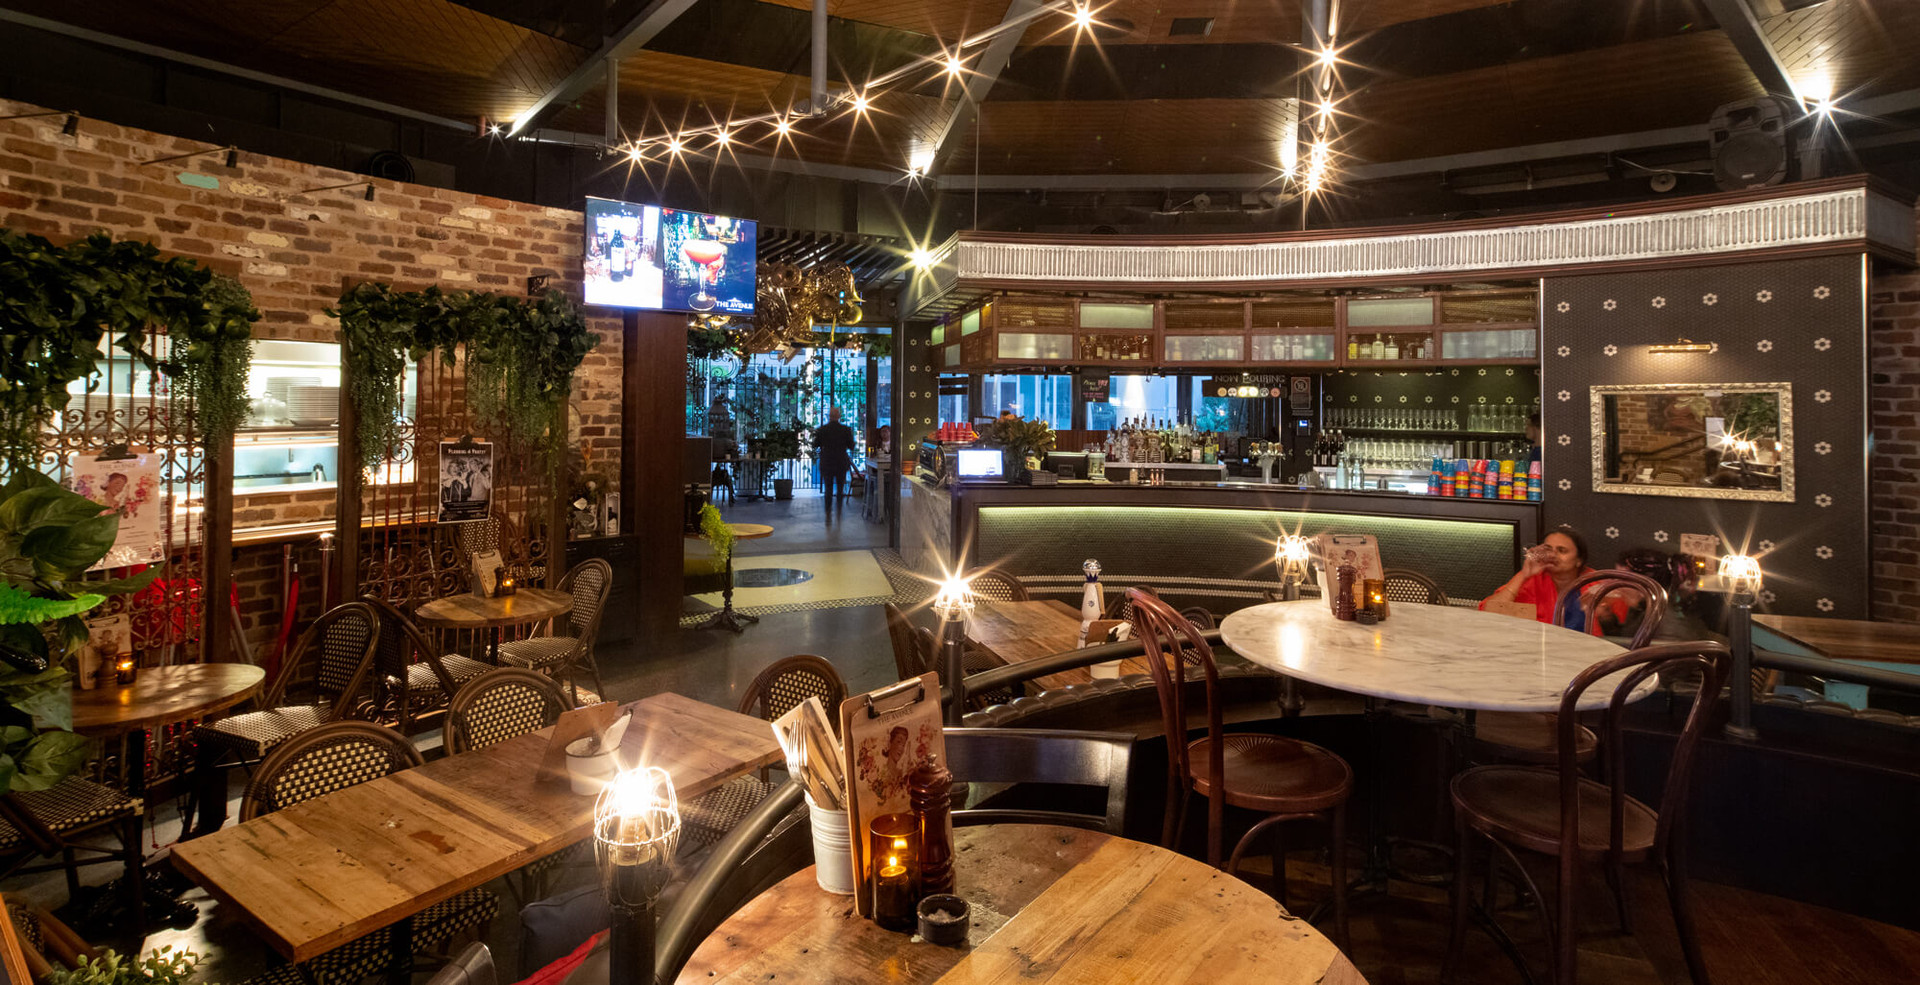 The Avenue Bar and Kitchen Restaurant Interior Design Concept